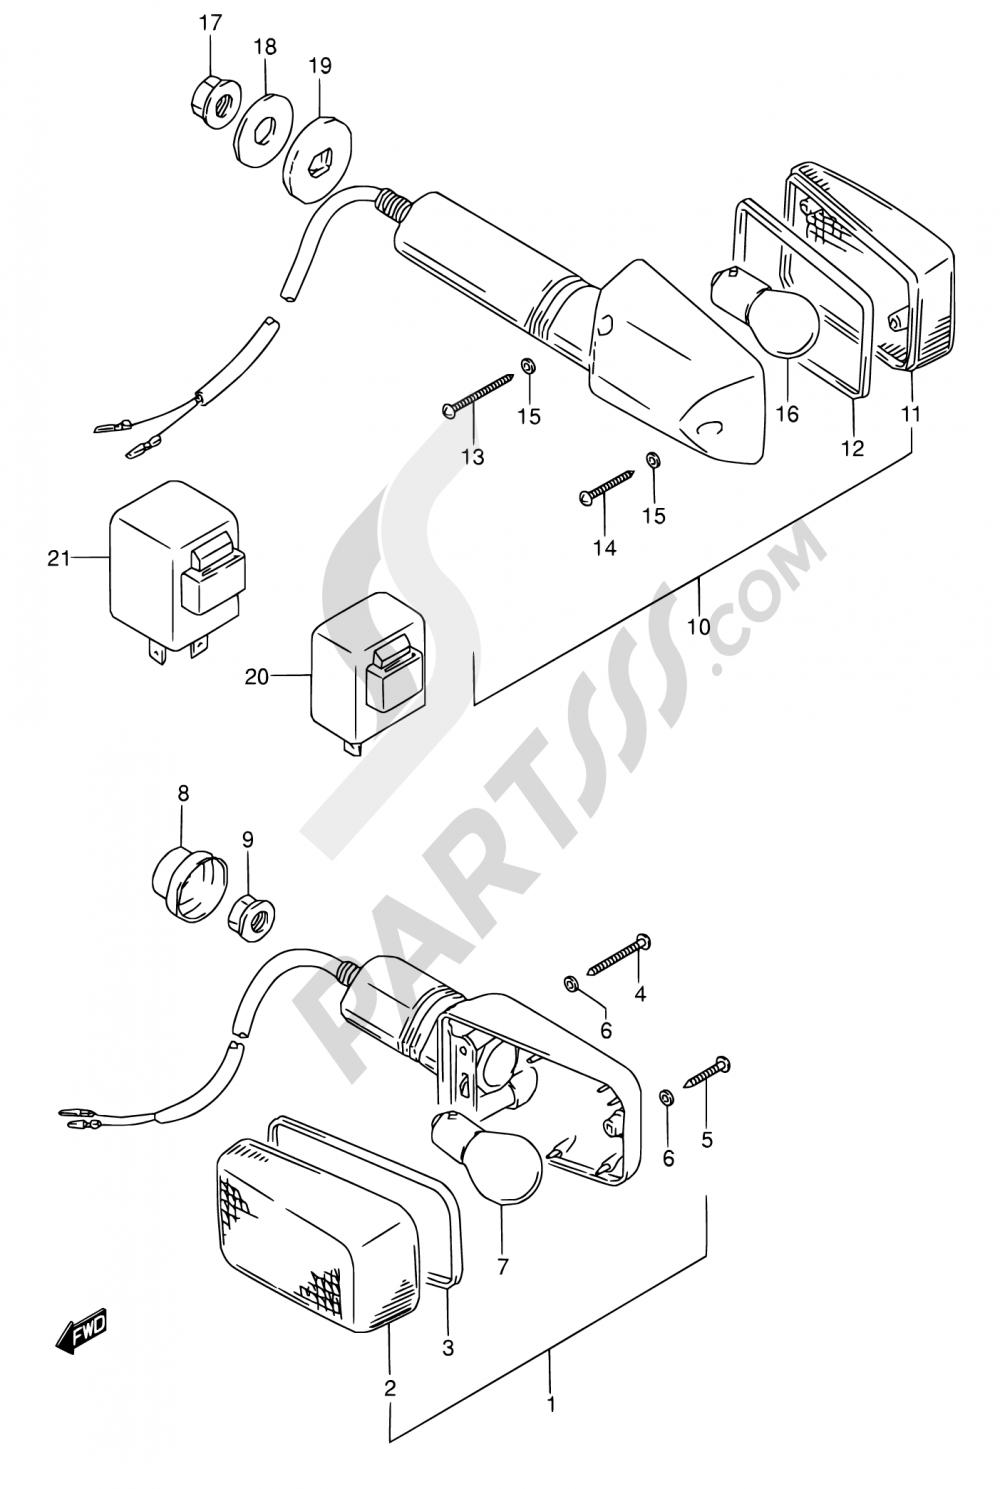 26 - TURNSIGNAL LAMP (MODEL K/L/M/N/P/R) Suzuki GS500E 1991